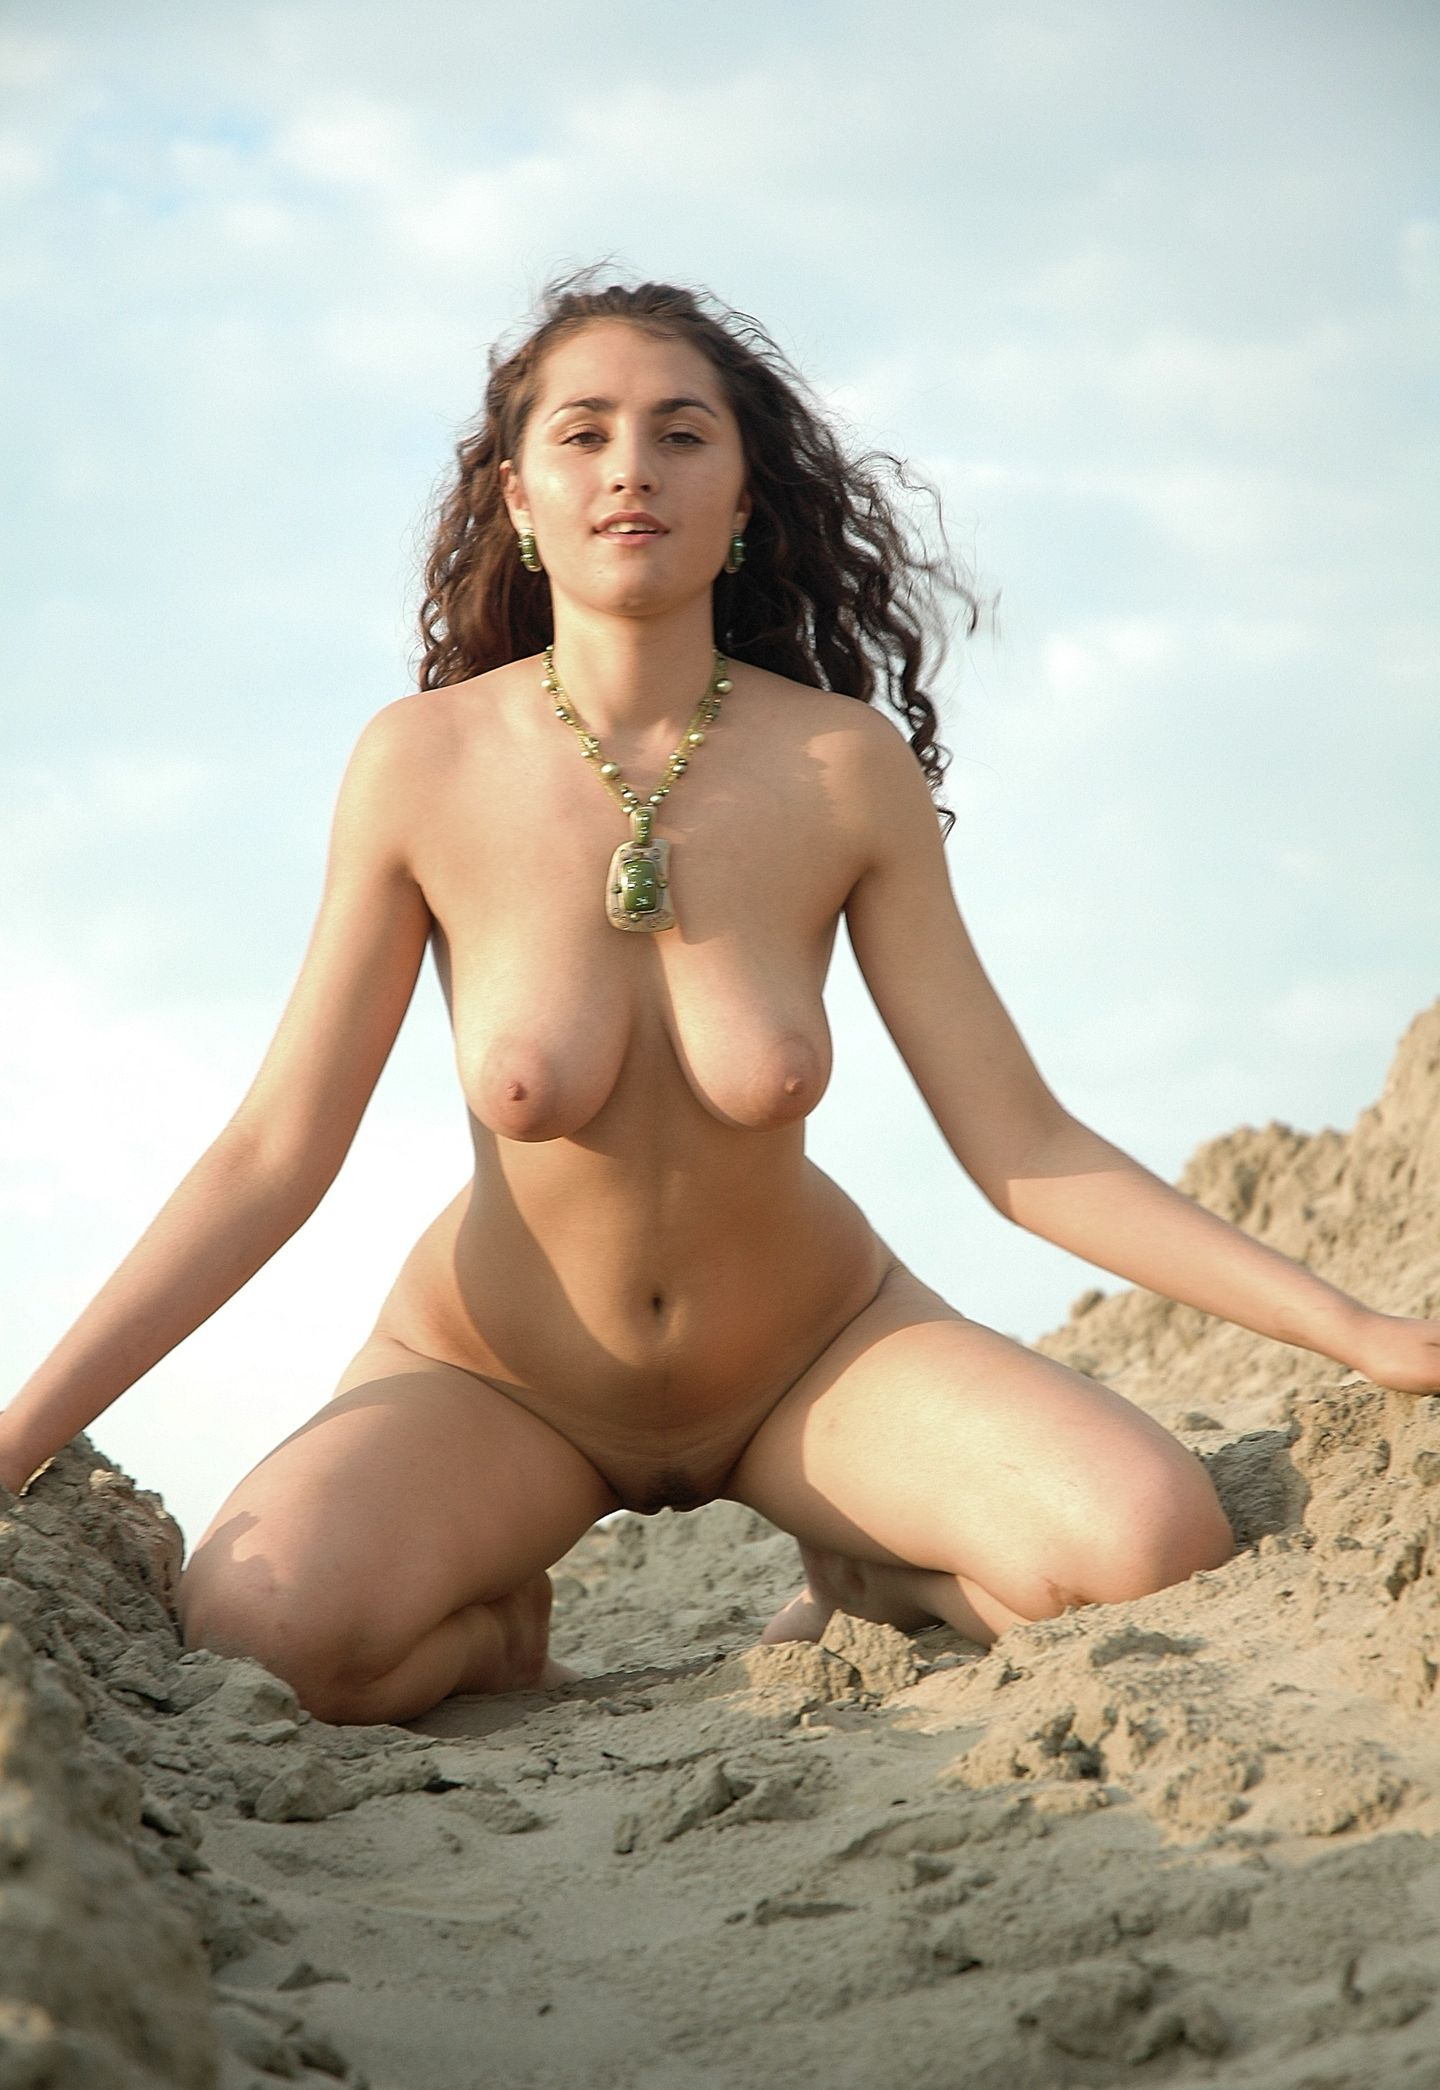 Busty israeli women naked boobs